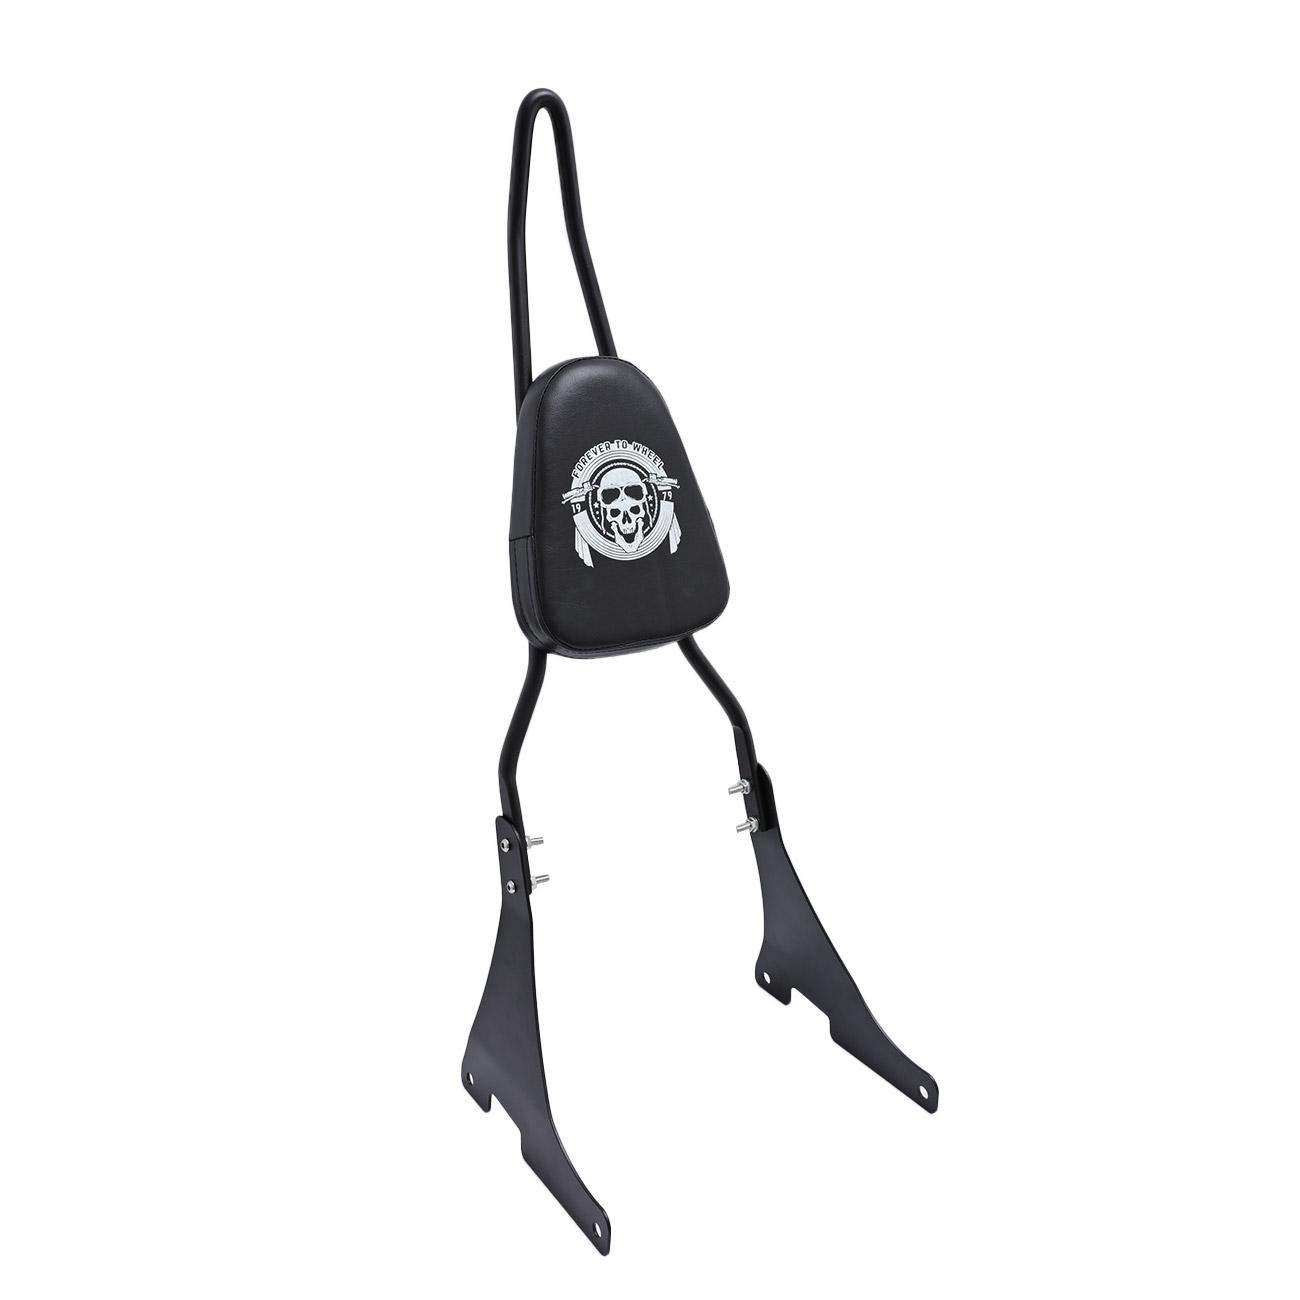 INNOGLOW Motorcycle Black Detachable Rear Passenger Sissy Bar Upright Backrest W/Cushion Pad for Harley Sportster XL 883 1200 2004-Up